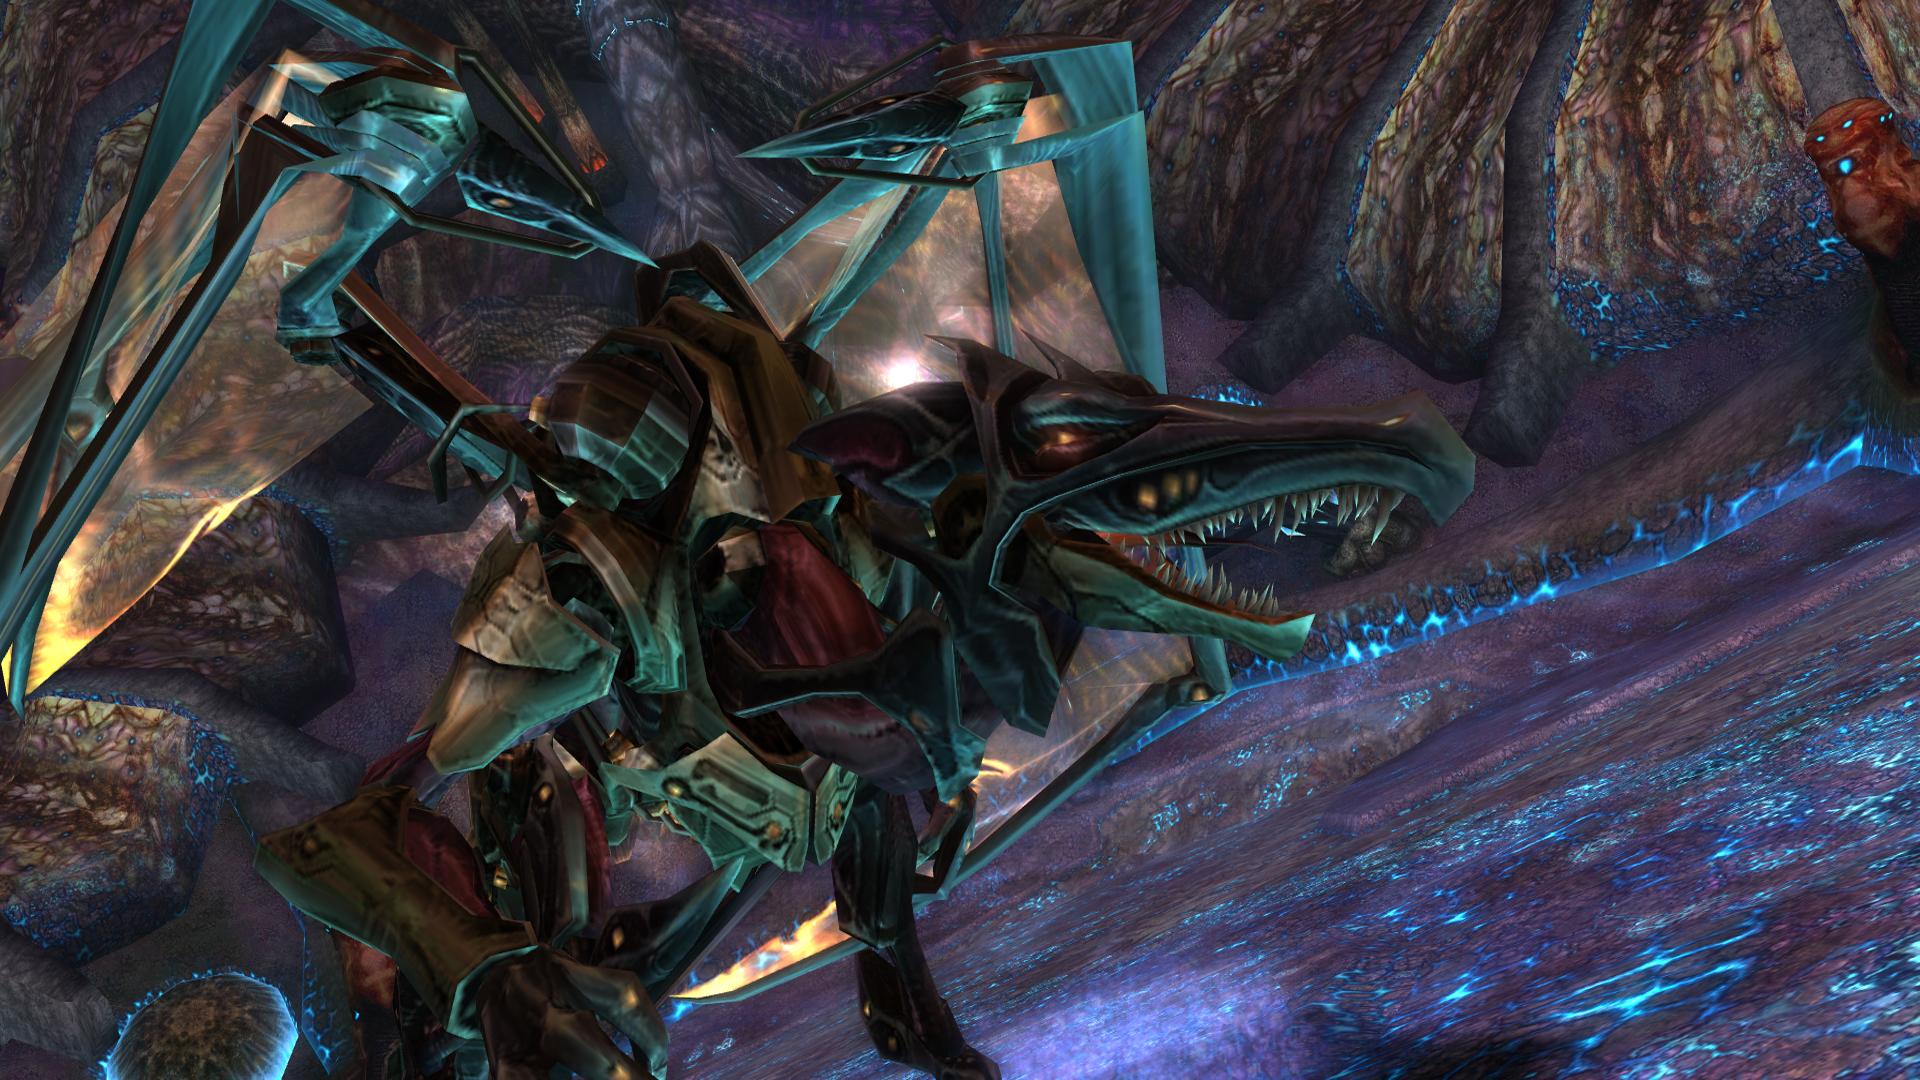 Phazon-enhanced armorskin